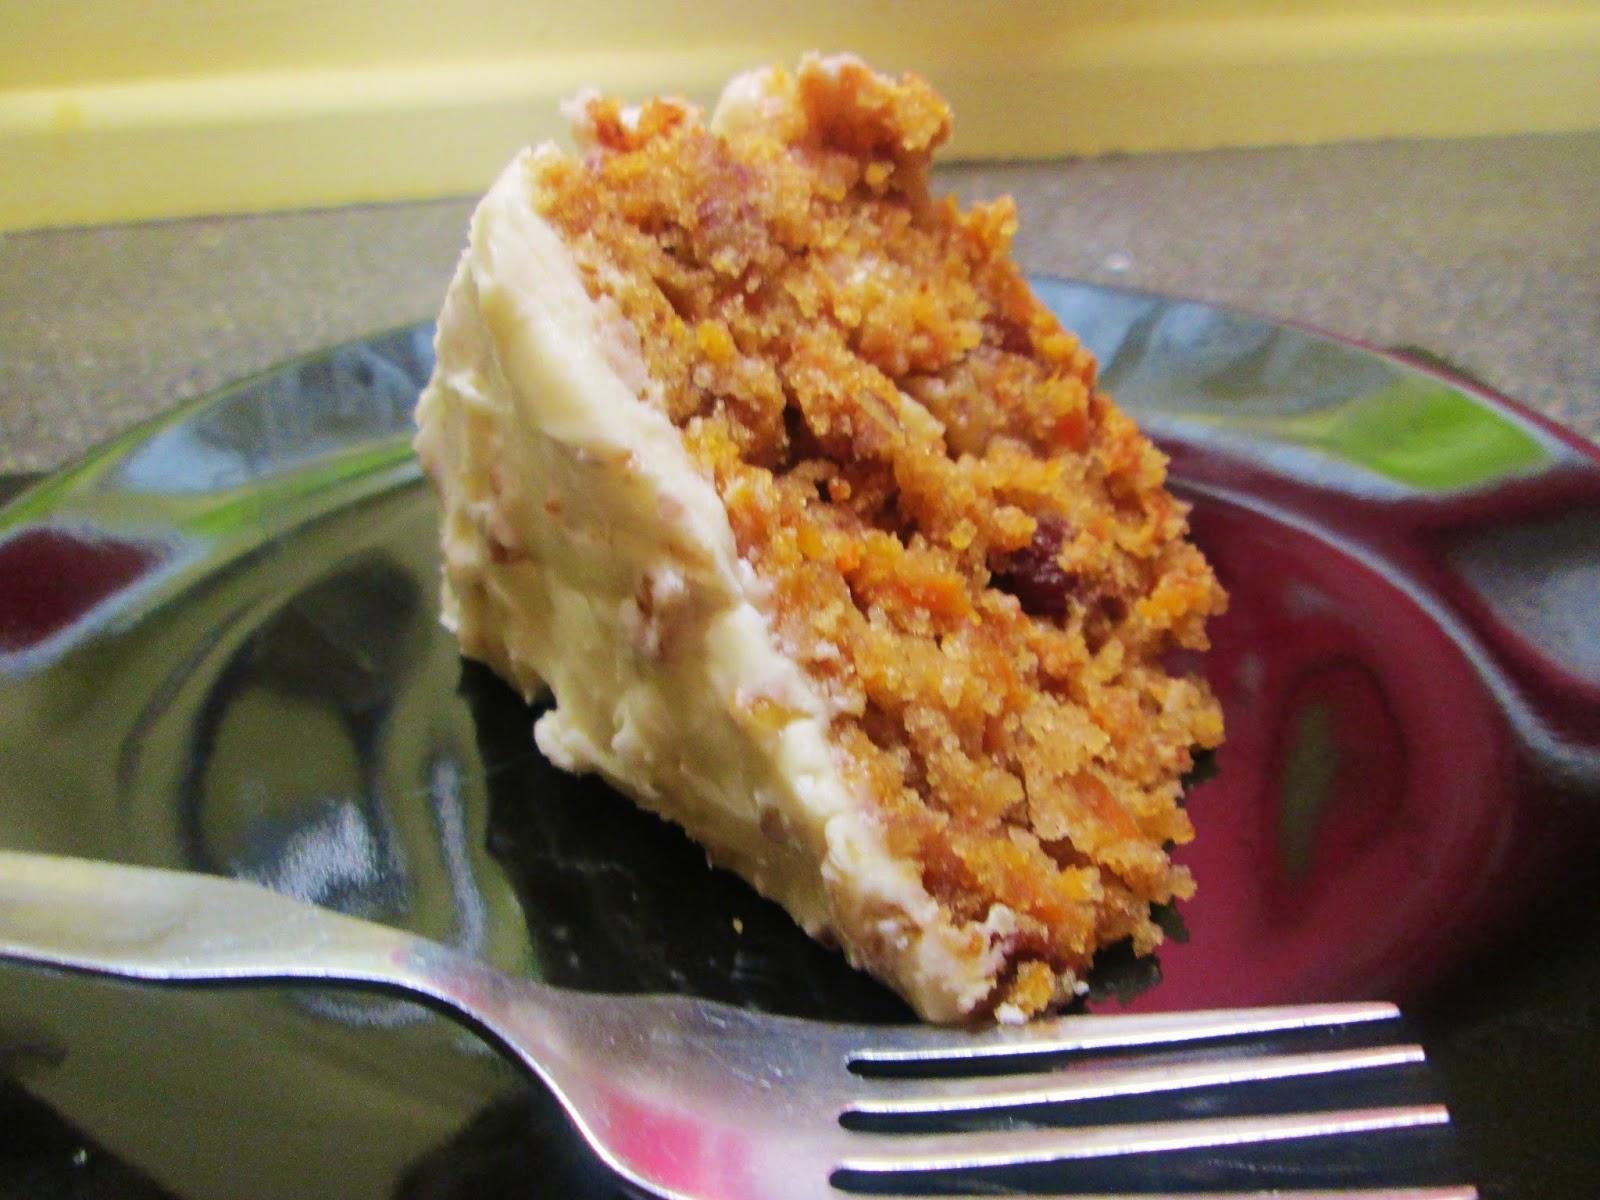 http://themessykitchenuk.blogspot.co.uk/2013/07/carrot-cake.html